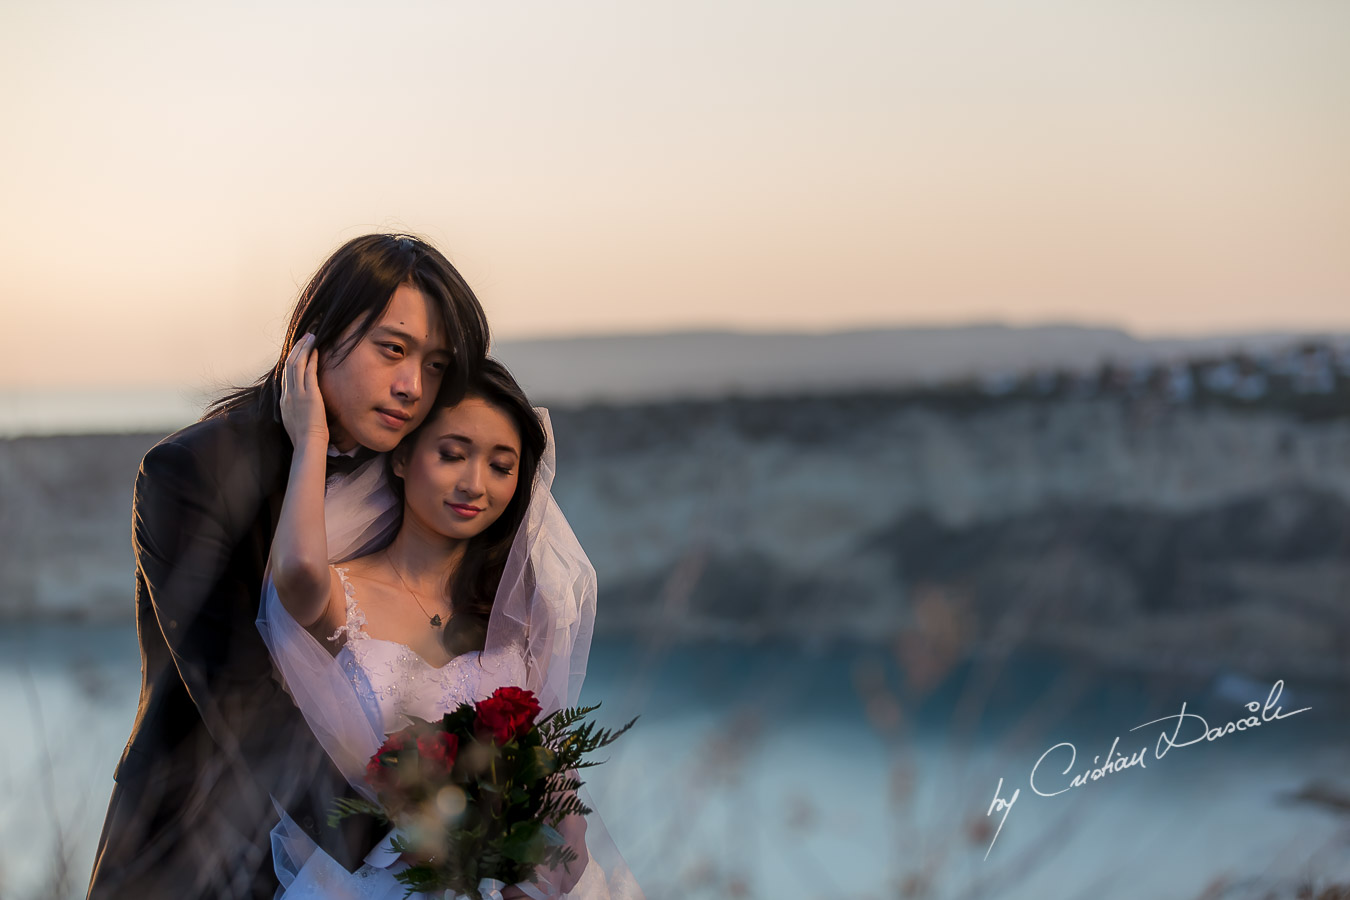 Pre Wedding Photoshoot in Cyprus - 14